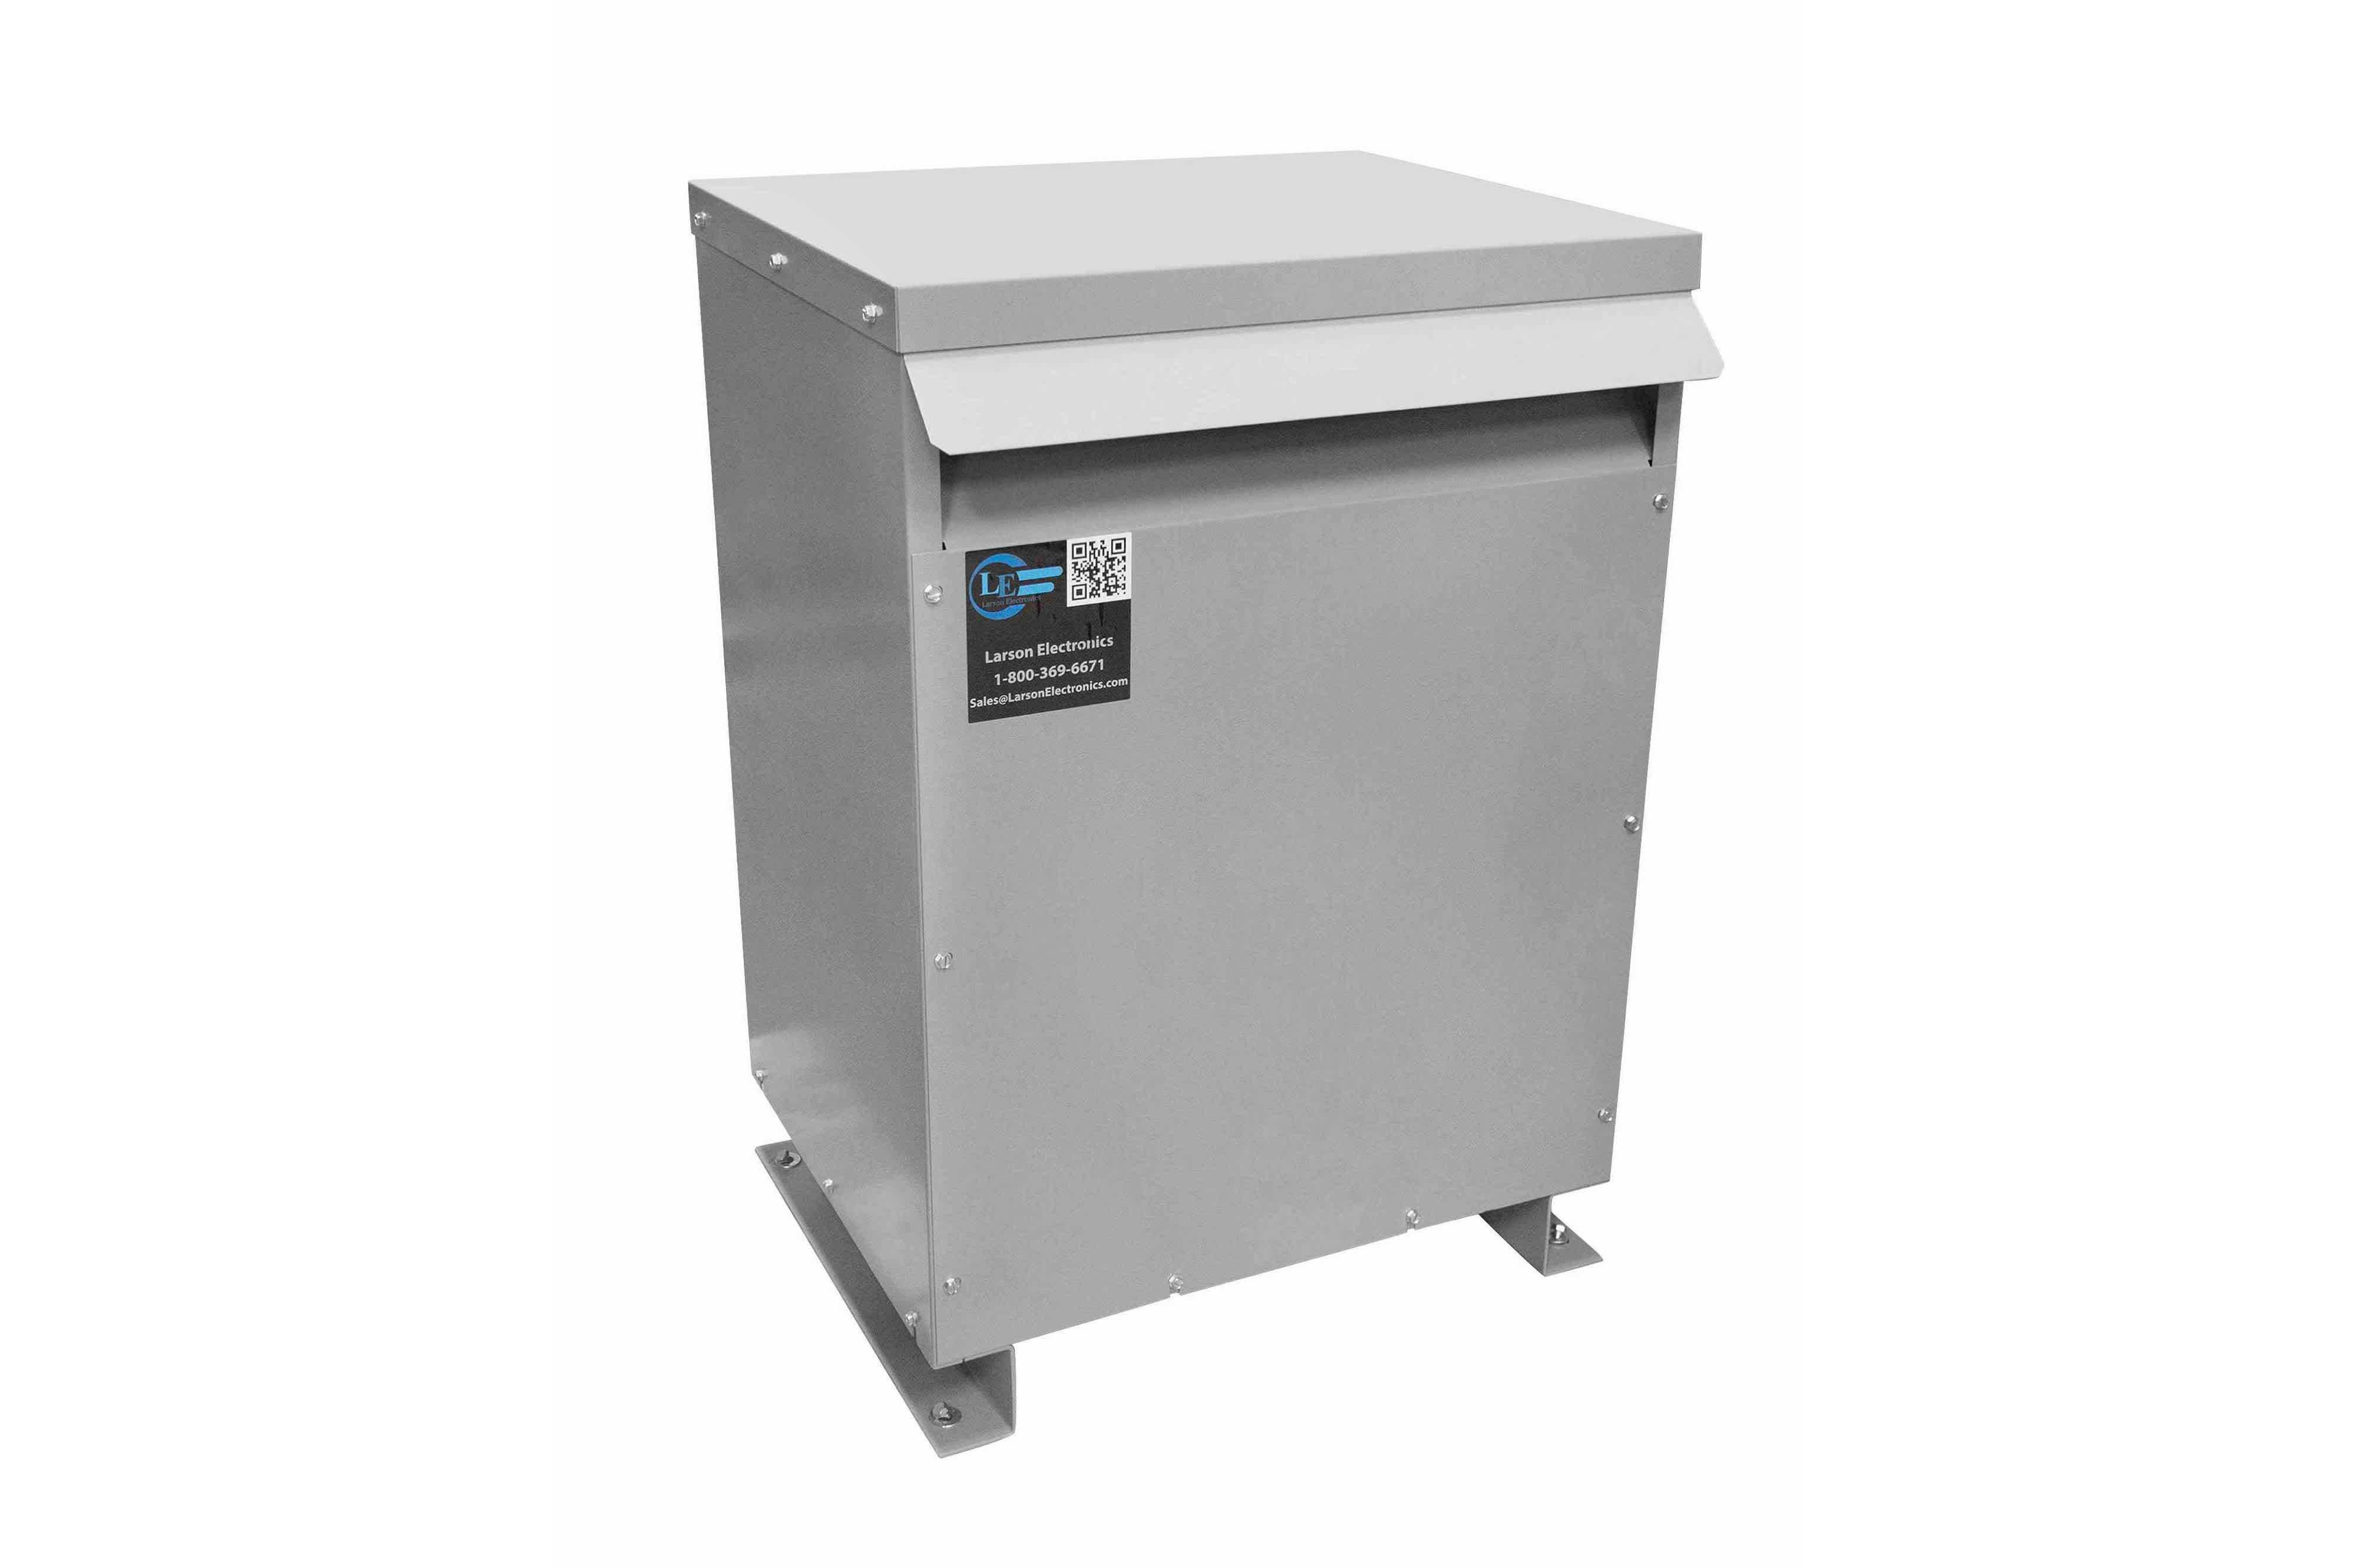 65 kVA 3PH Isolation Transformer, 400V Wye Primary, 208Y/120 Wye-N Secondary, N3R, Ventilated, 60 Hz